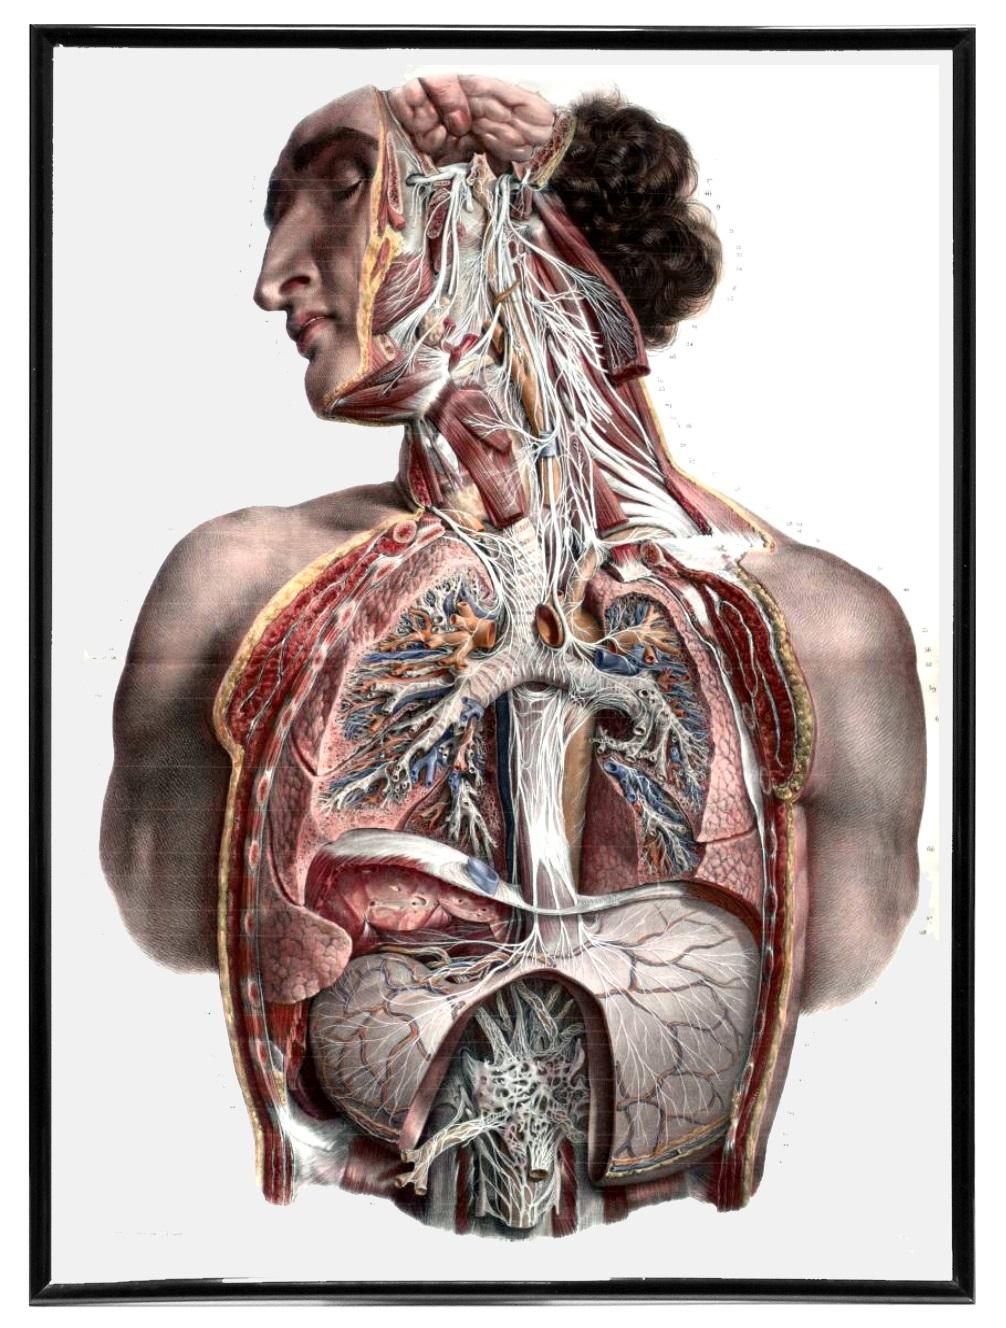 Vintage Anatomy Art and Book Illustrations - RetroGraphik